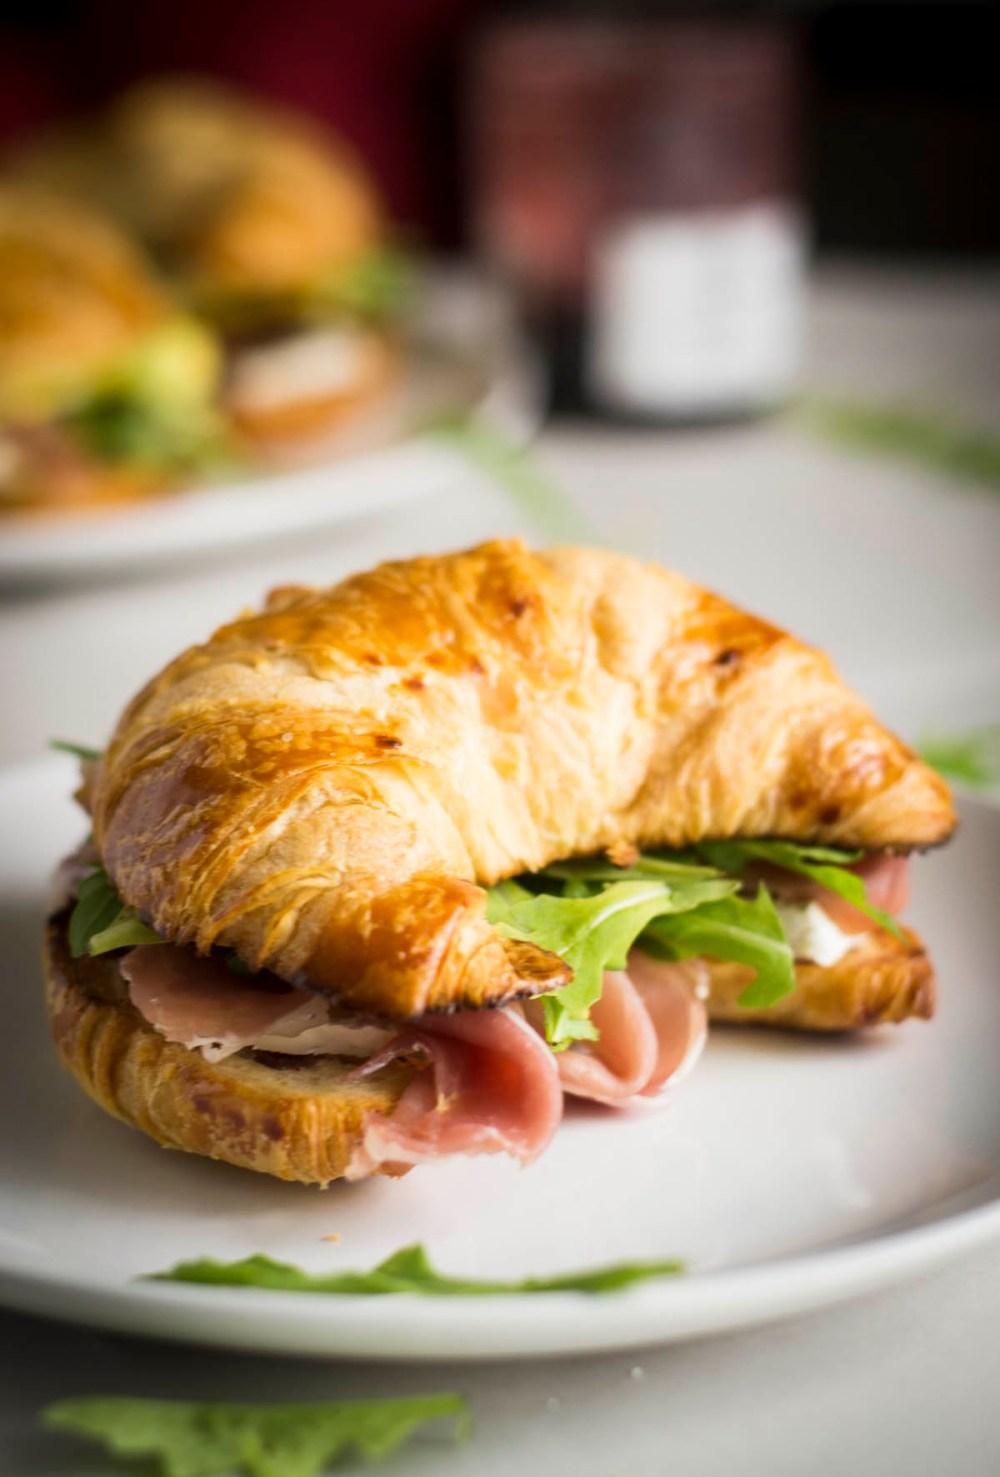 Breakfast Croissant Sandwiches on plate